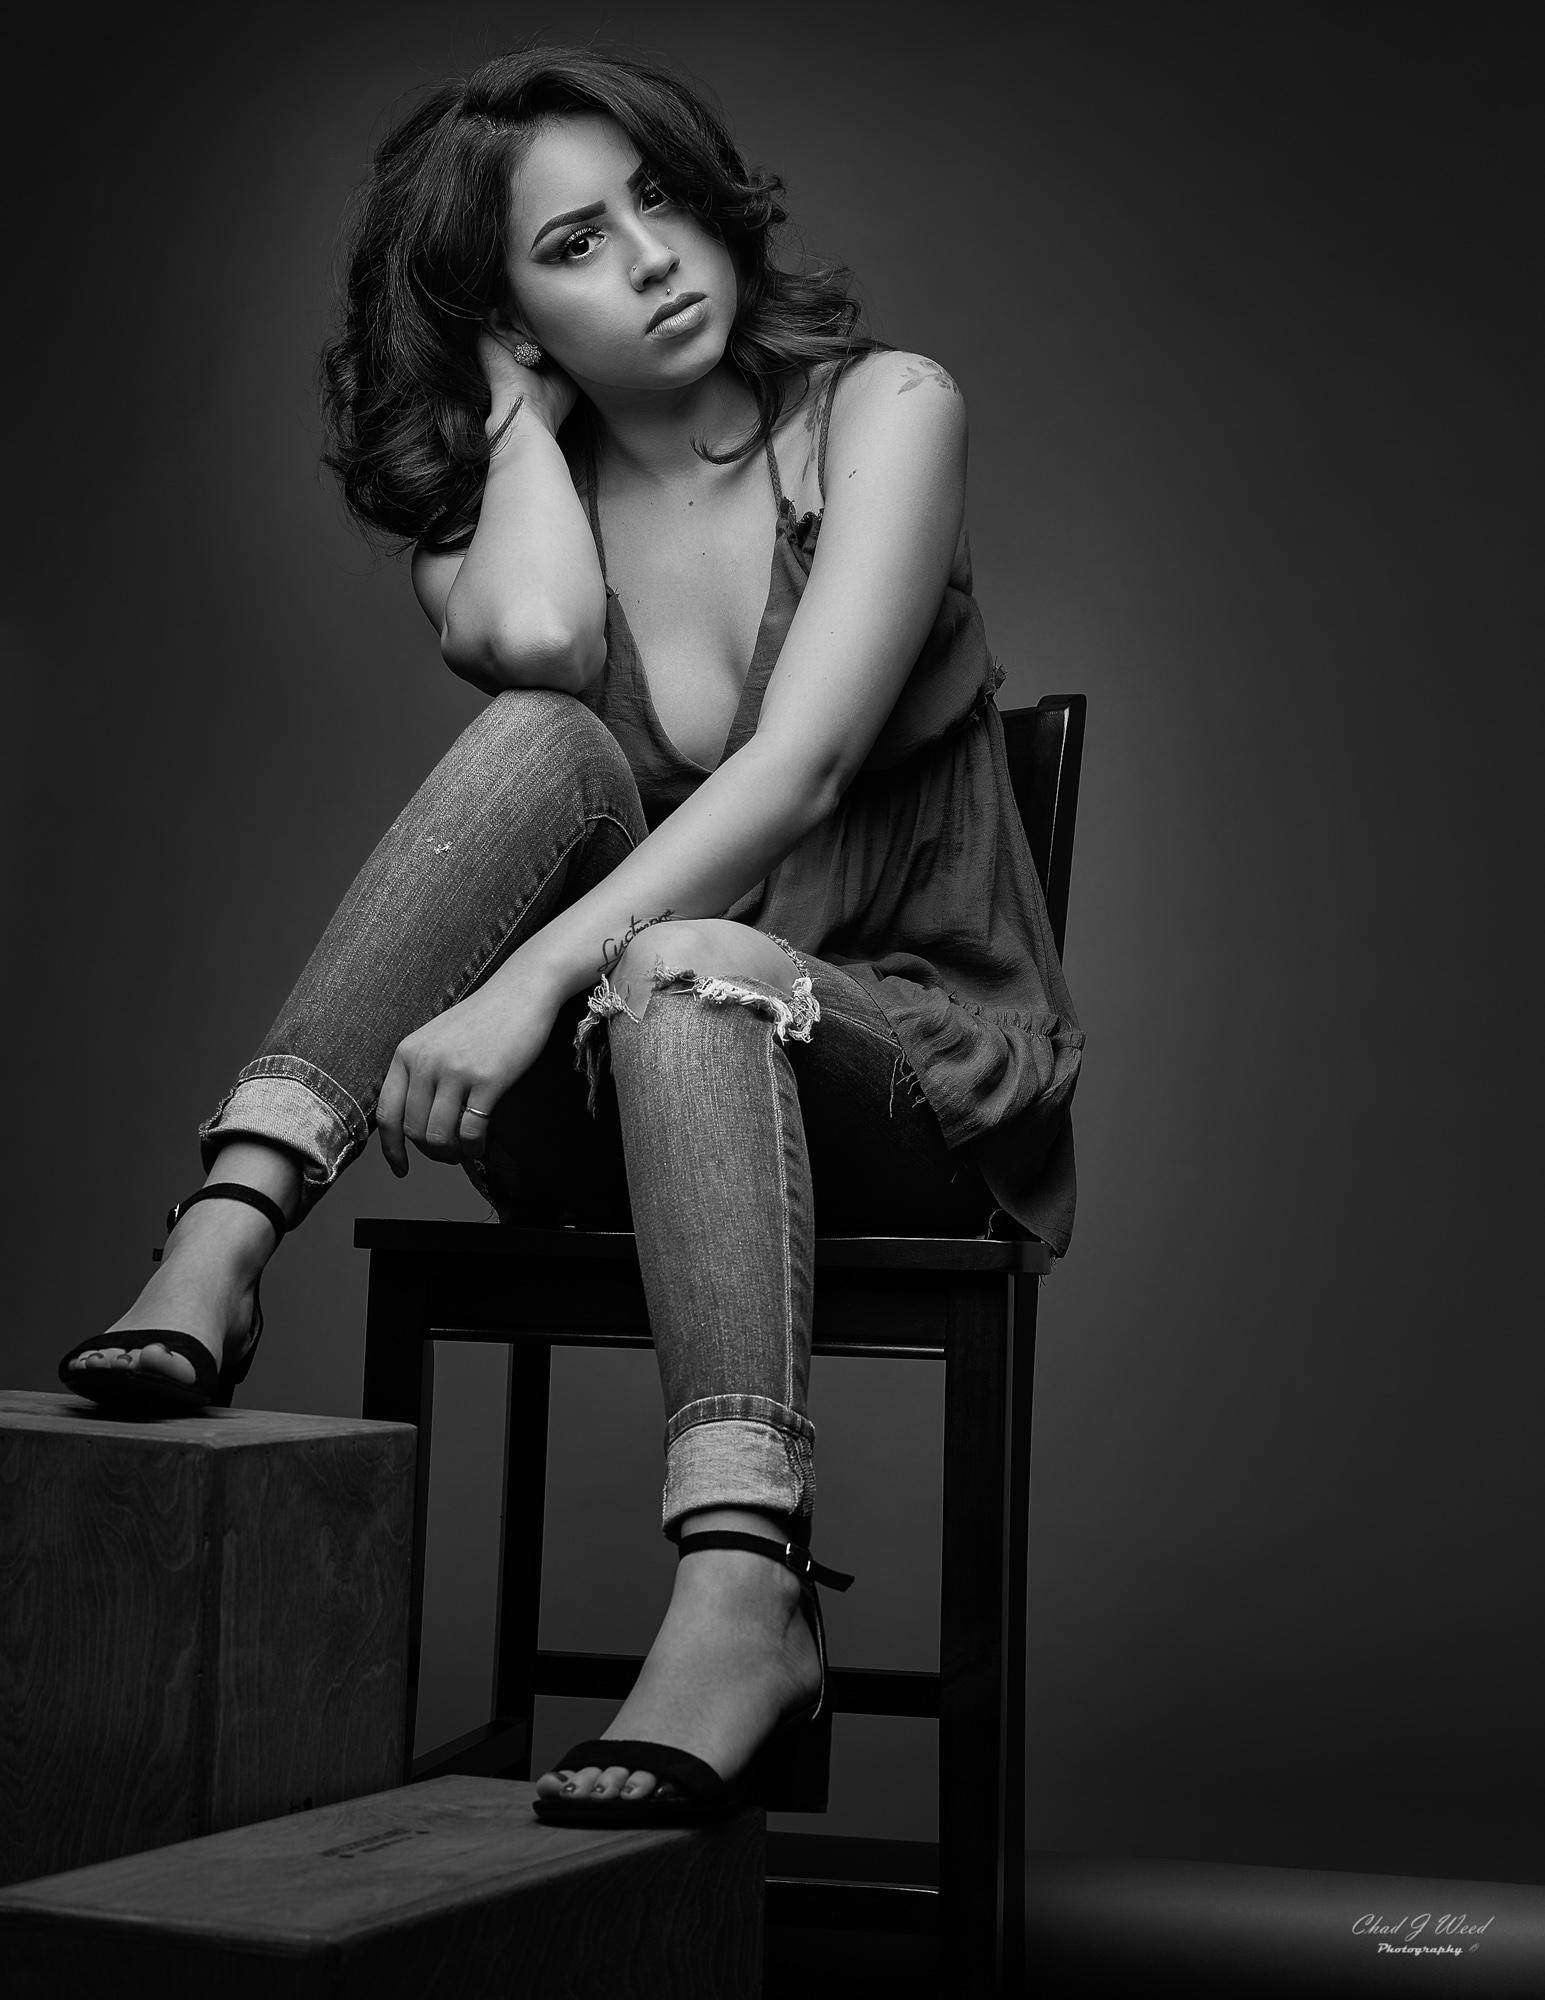 Carissa Beauty by Mesa Arizona Portrait Photographer Chad Weed